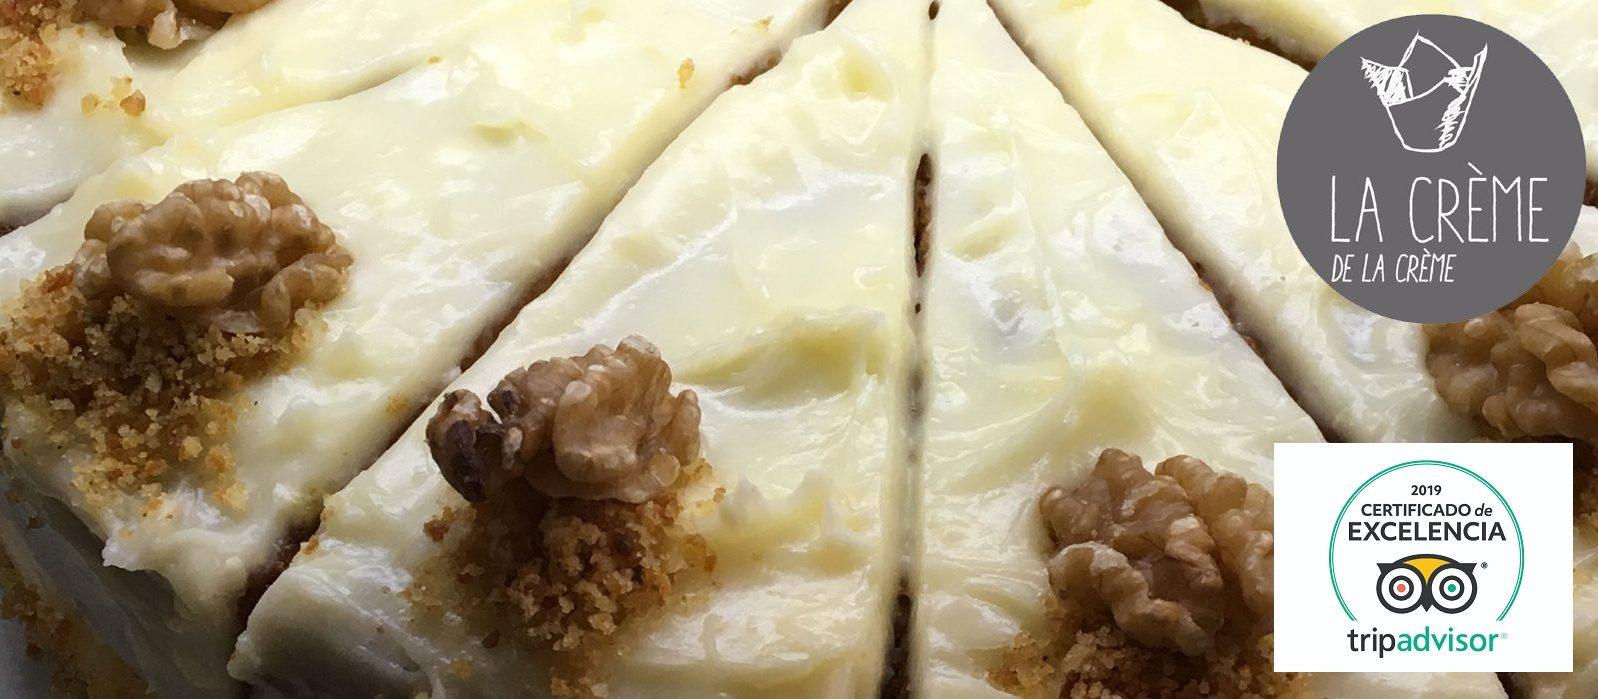 tarta-de-zanahoria-sevilla-la-creme-de-la-creme-certificado de excelencia tripadvisor sevilla